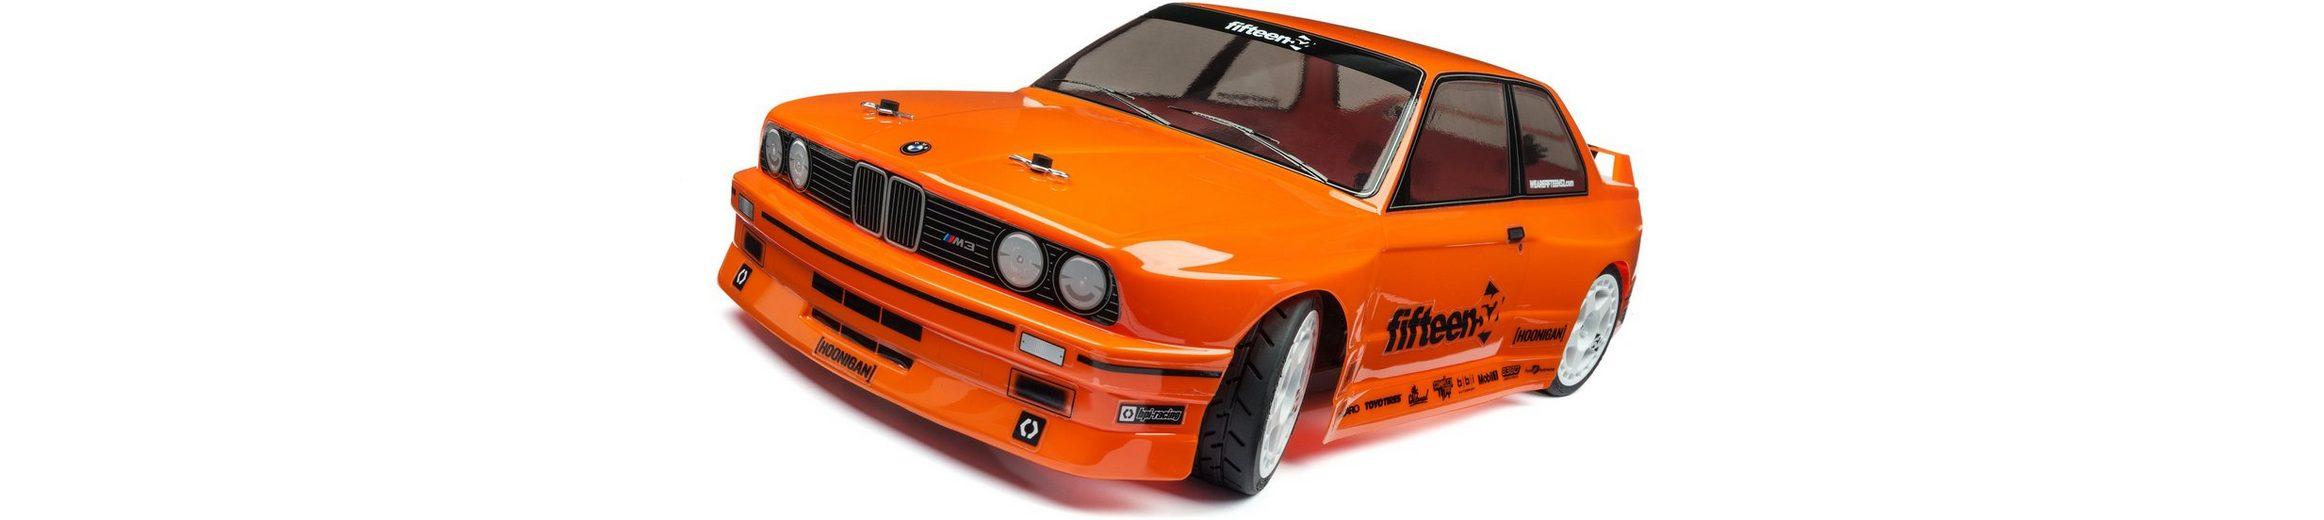 HPI Racing RC Komplettset, »RS4 Sport 3, BMW M3 E30 1:10 2,4 GHz«